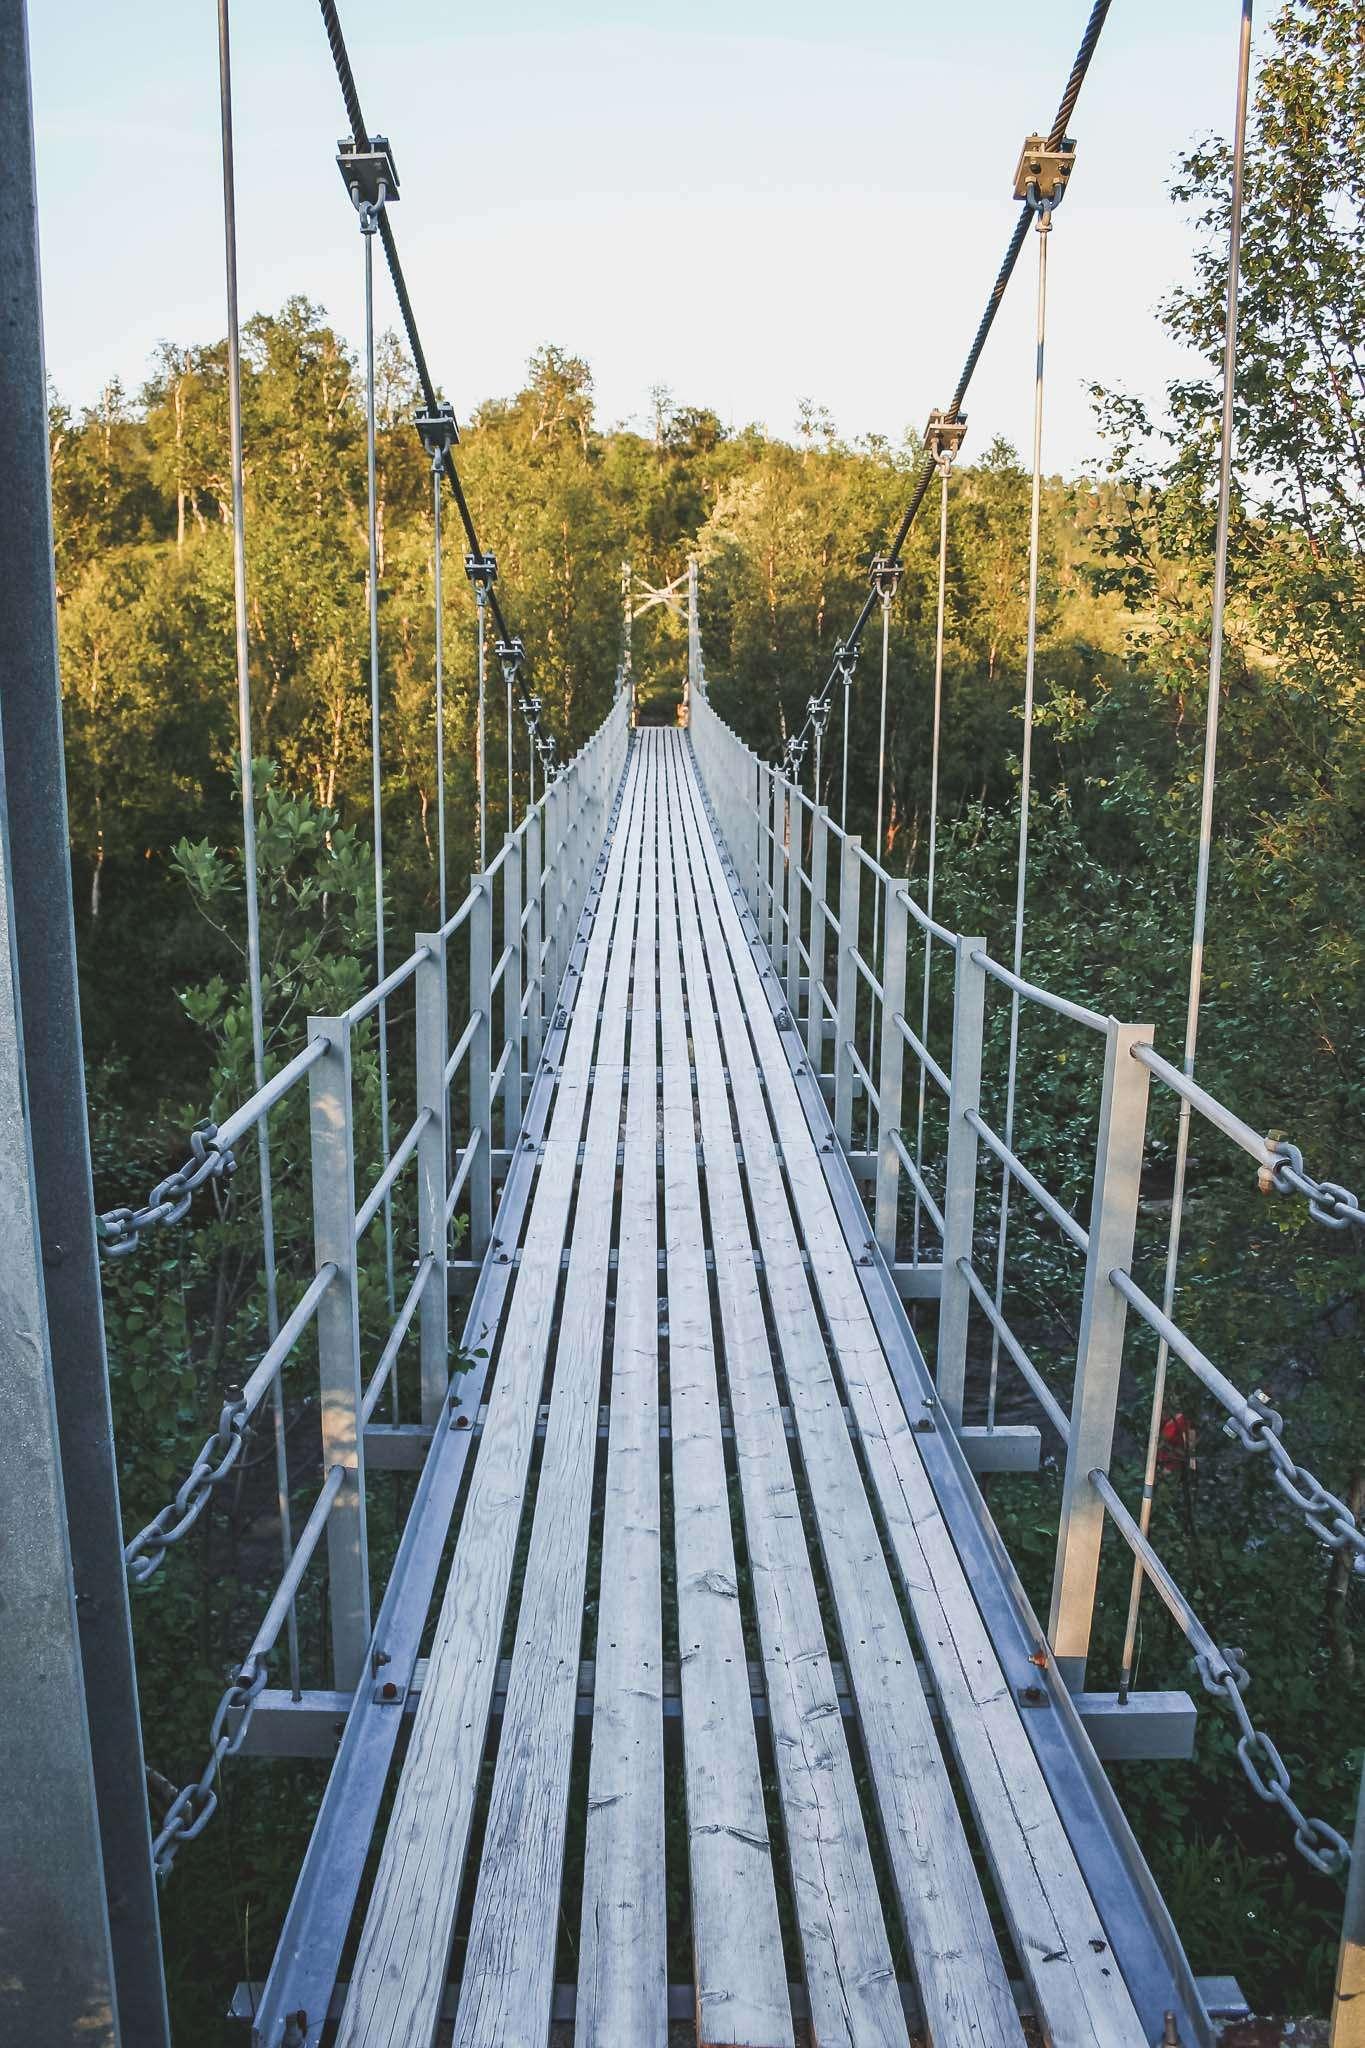 Hängebrücke im Moorgebiet vor Mo i Rana